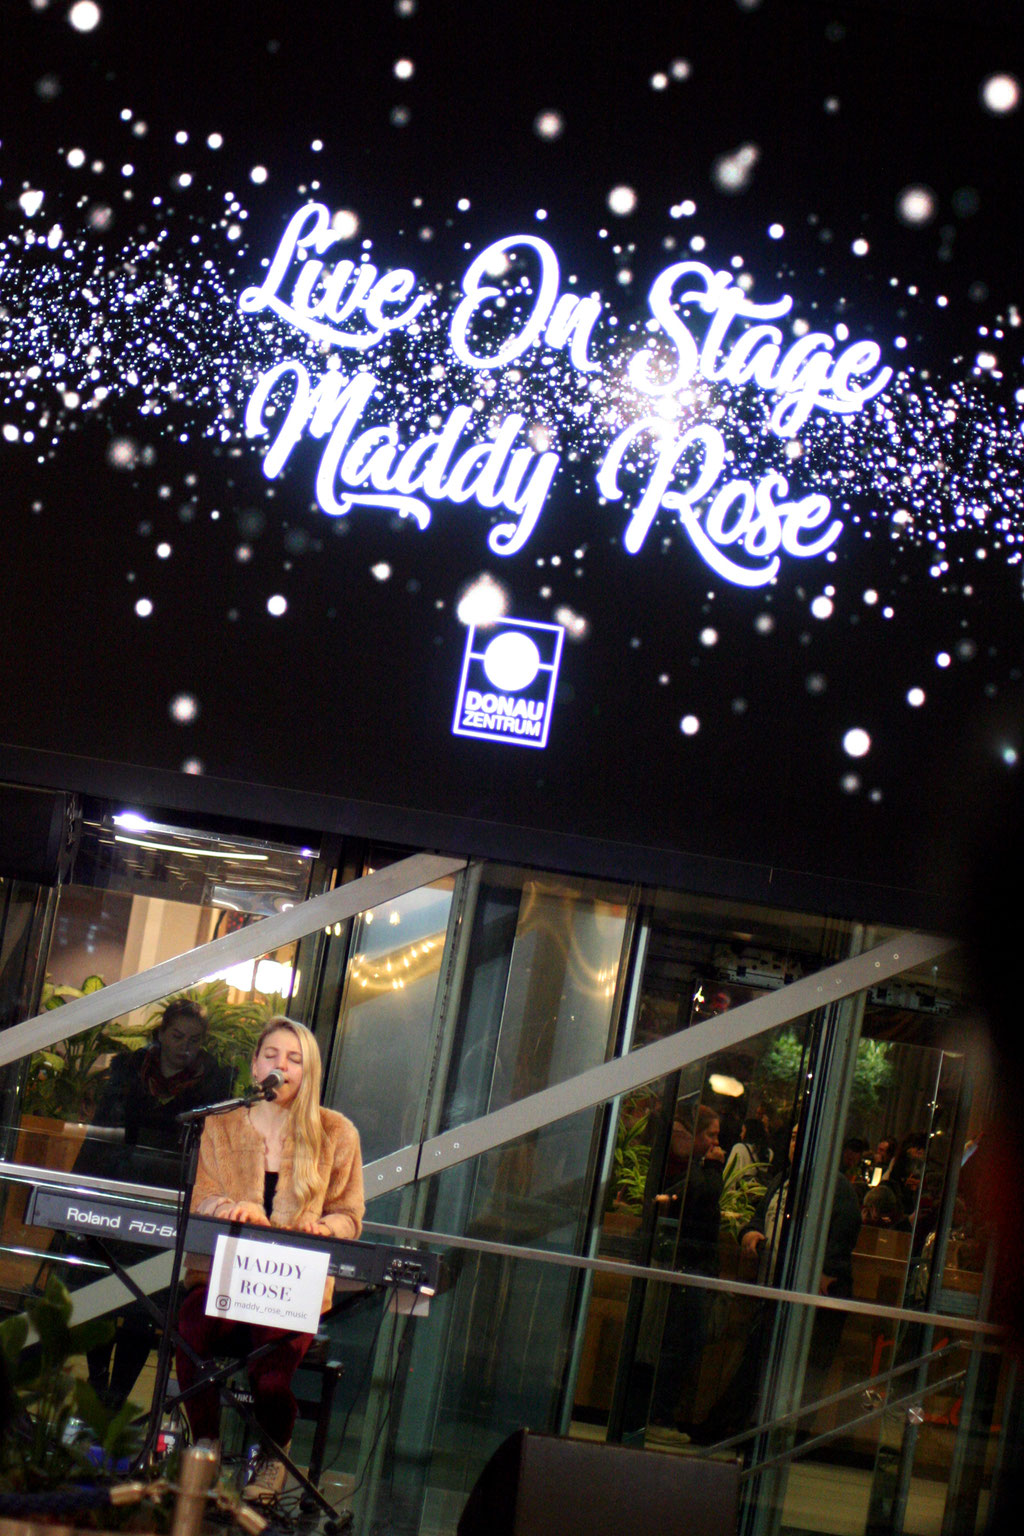 Maddy Rose @ The Kitchen, Donauzentrum, 16.11.2019 (c) miggl.at